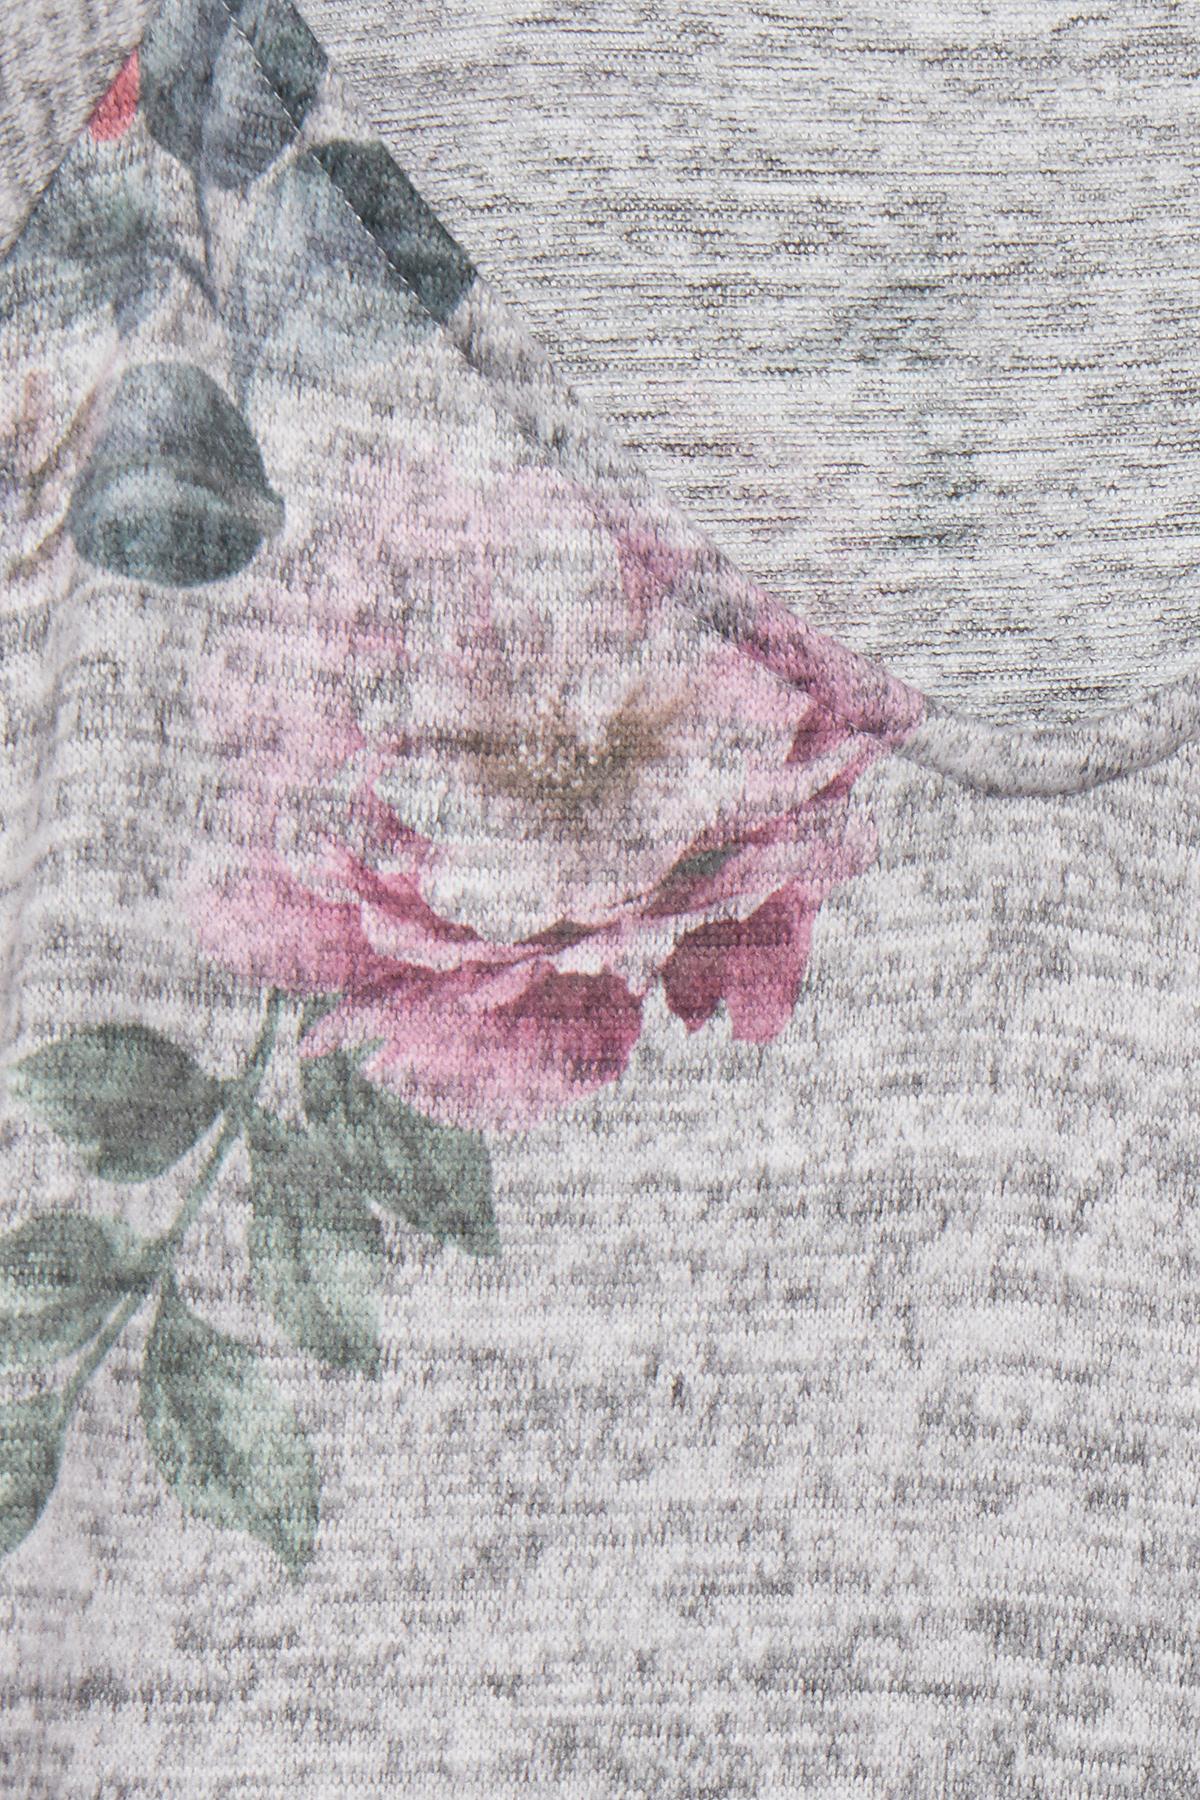 Gråmeleret Kortærmet T-shirt fra b.young – Køb Gråmeleret Kortærmet T-shirt fra str. XS-XXL her